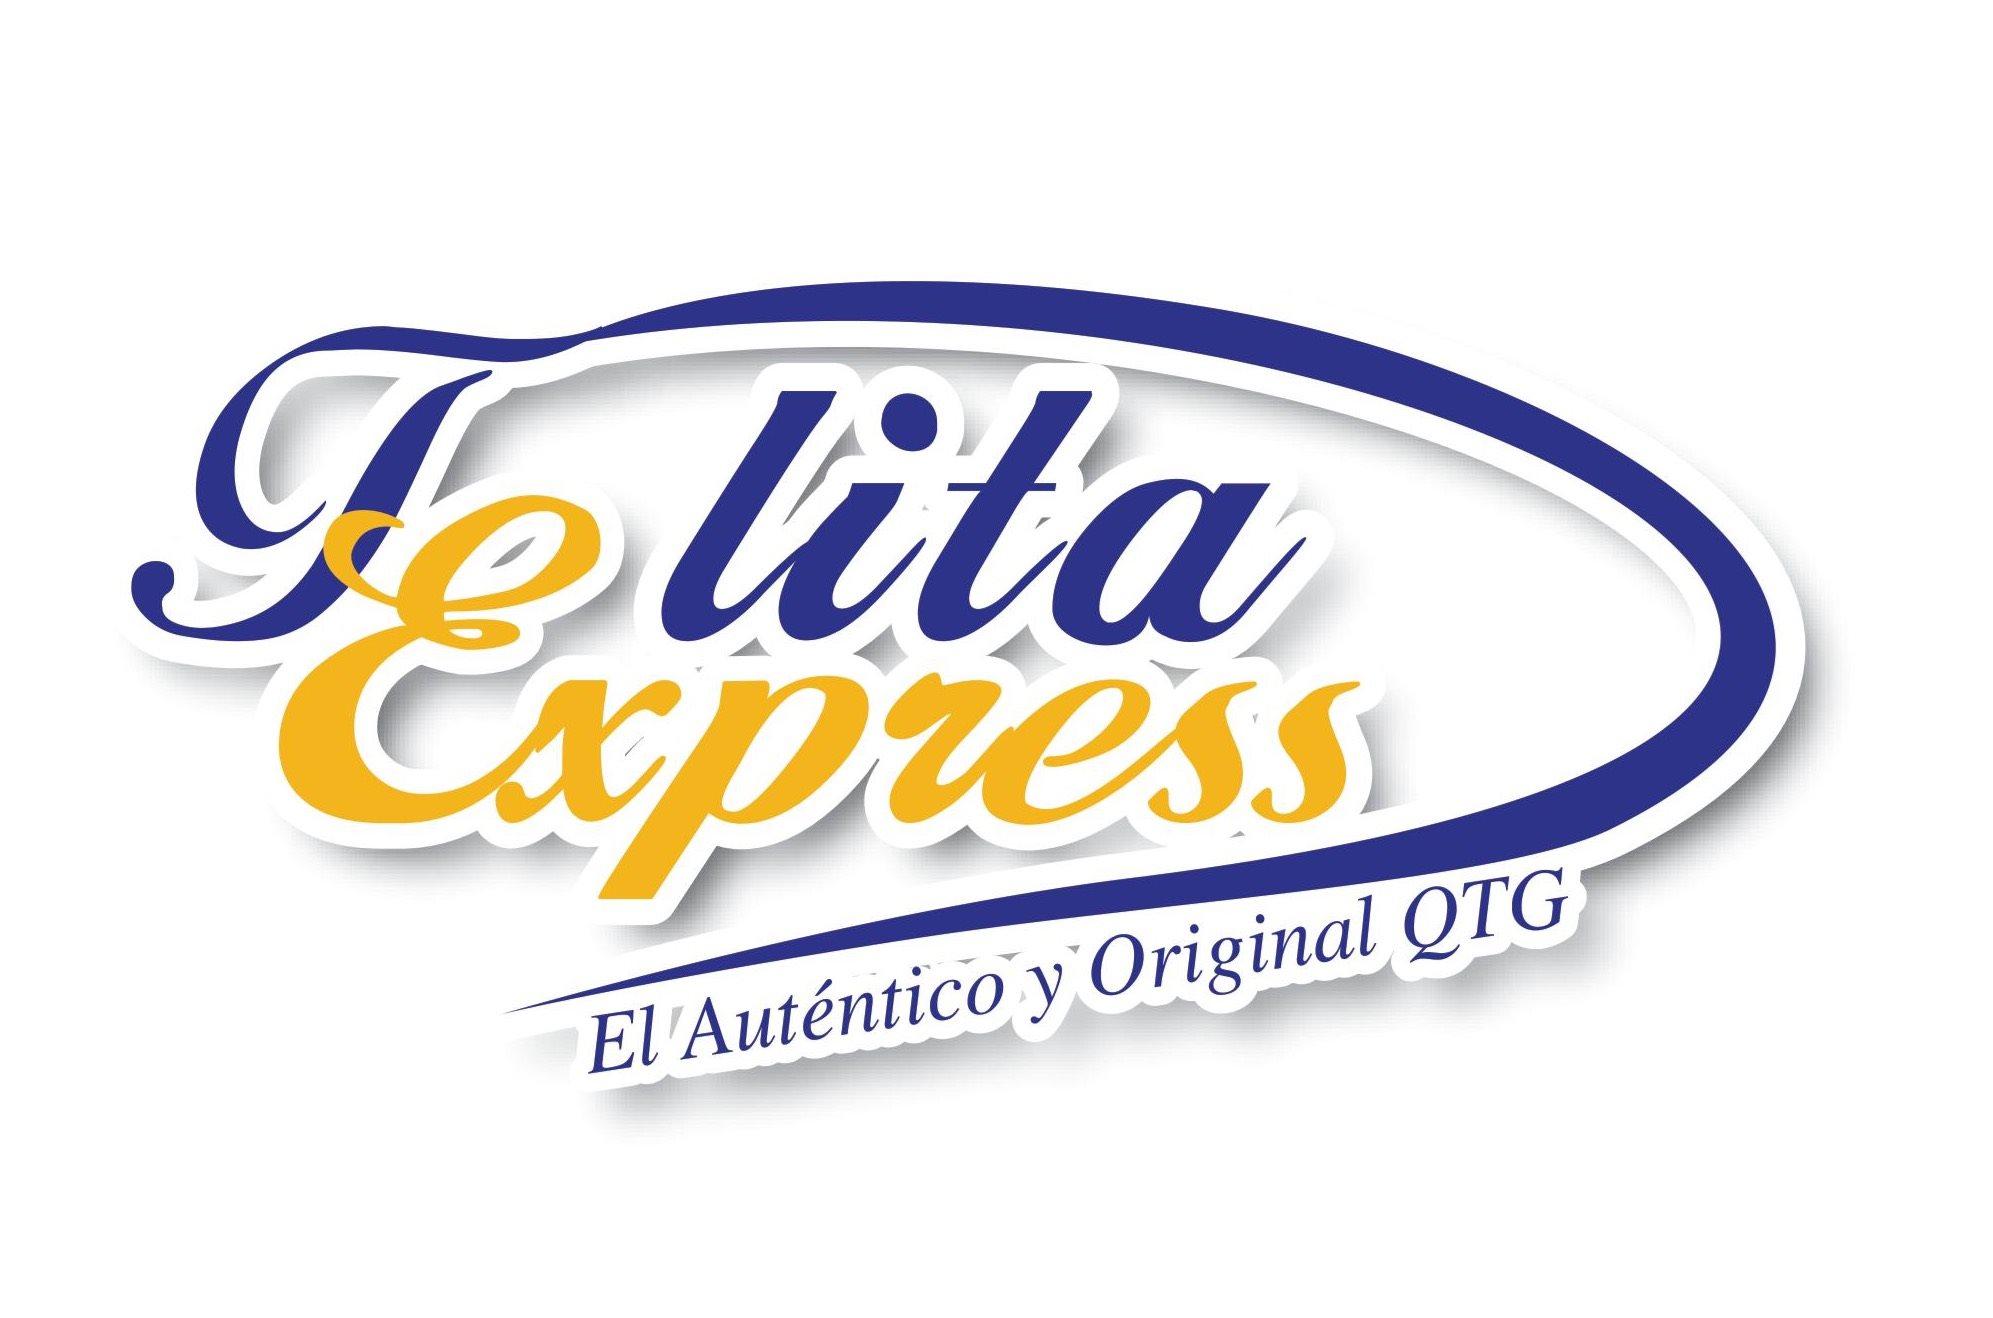 Telita Express Customer Services New AGE,C.A